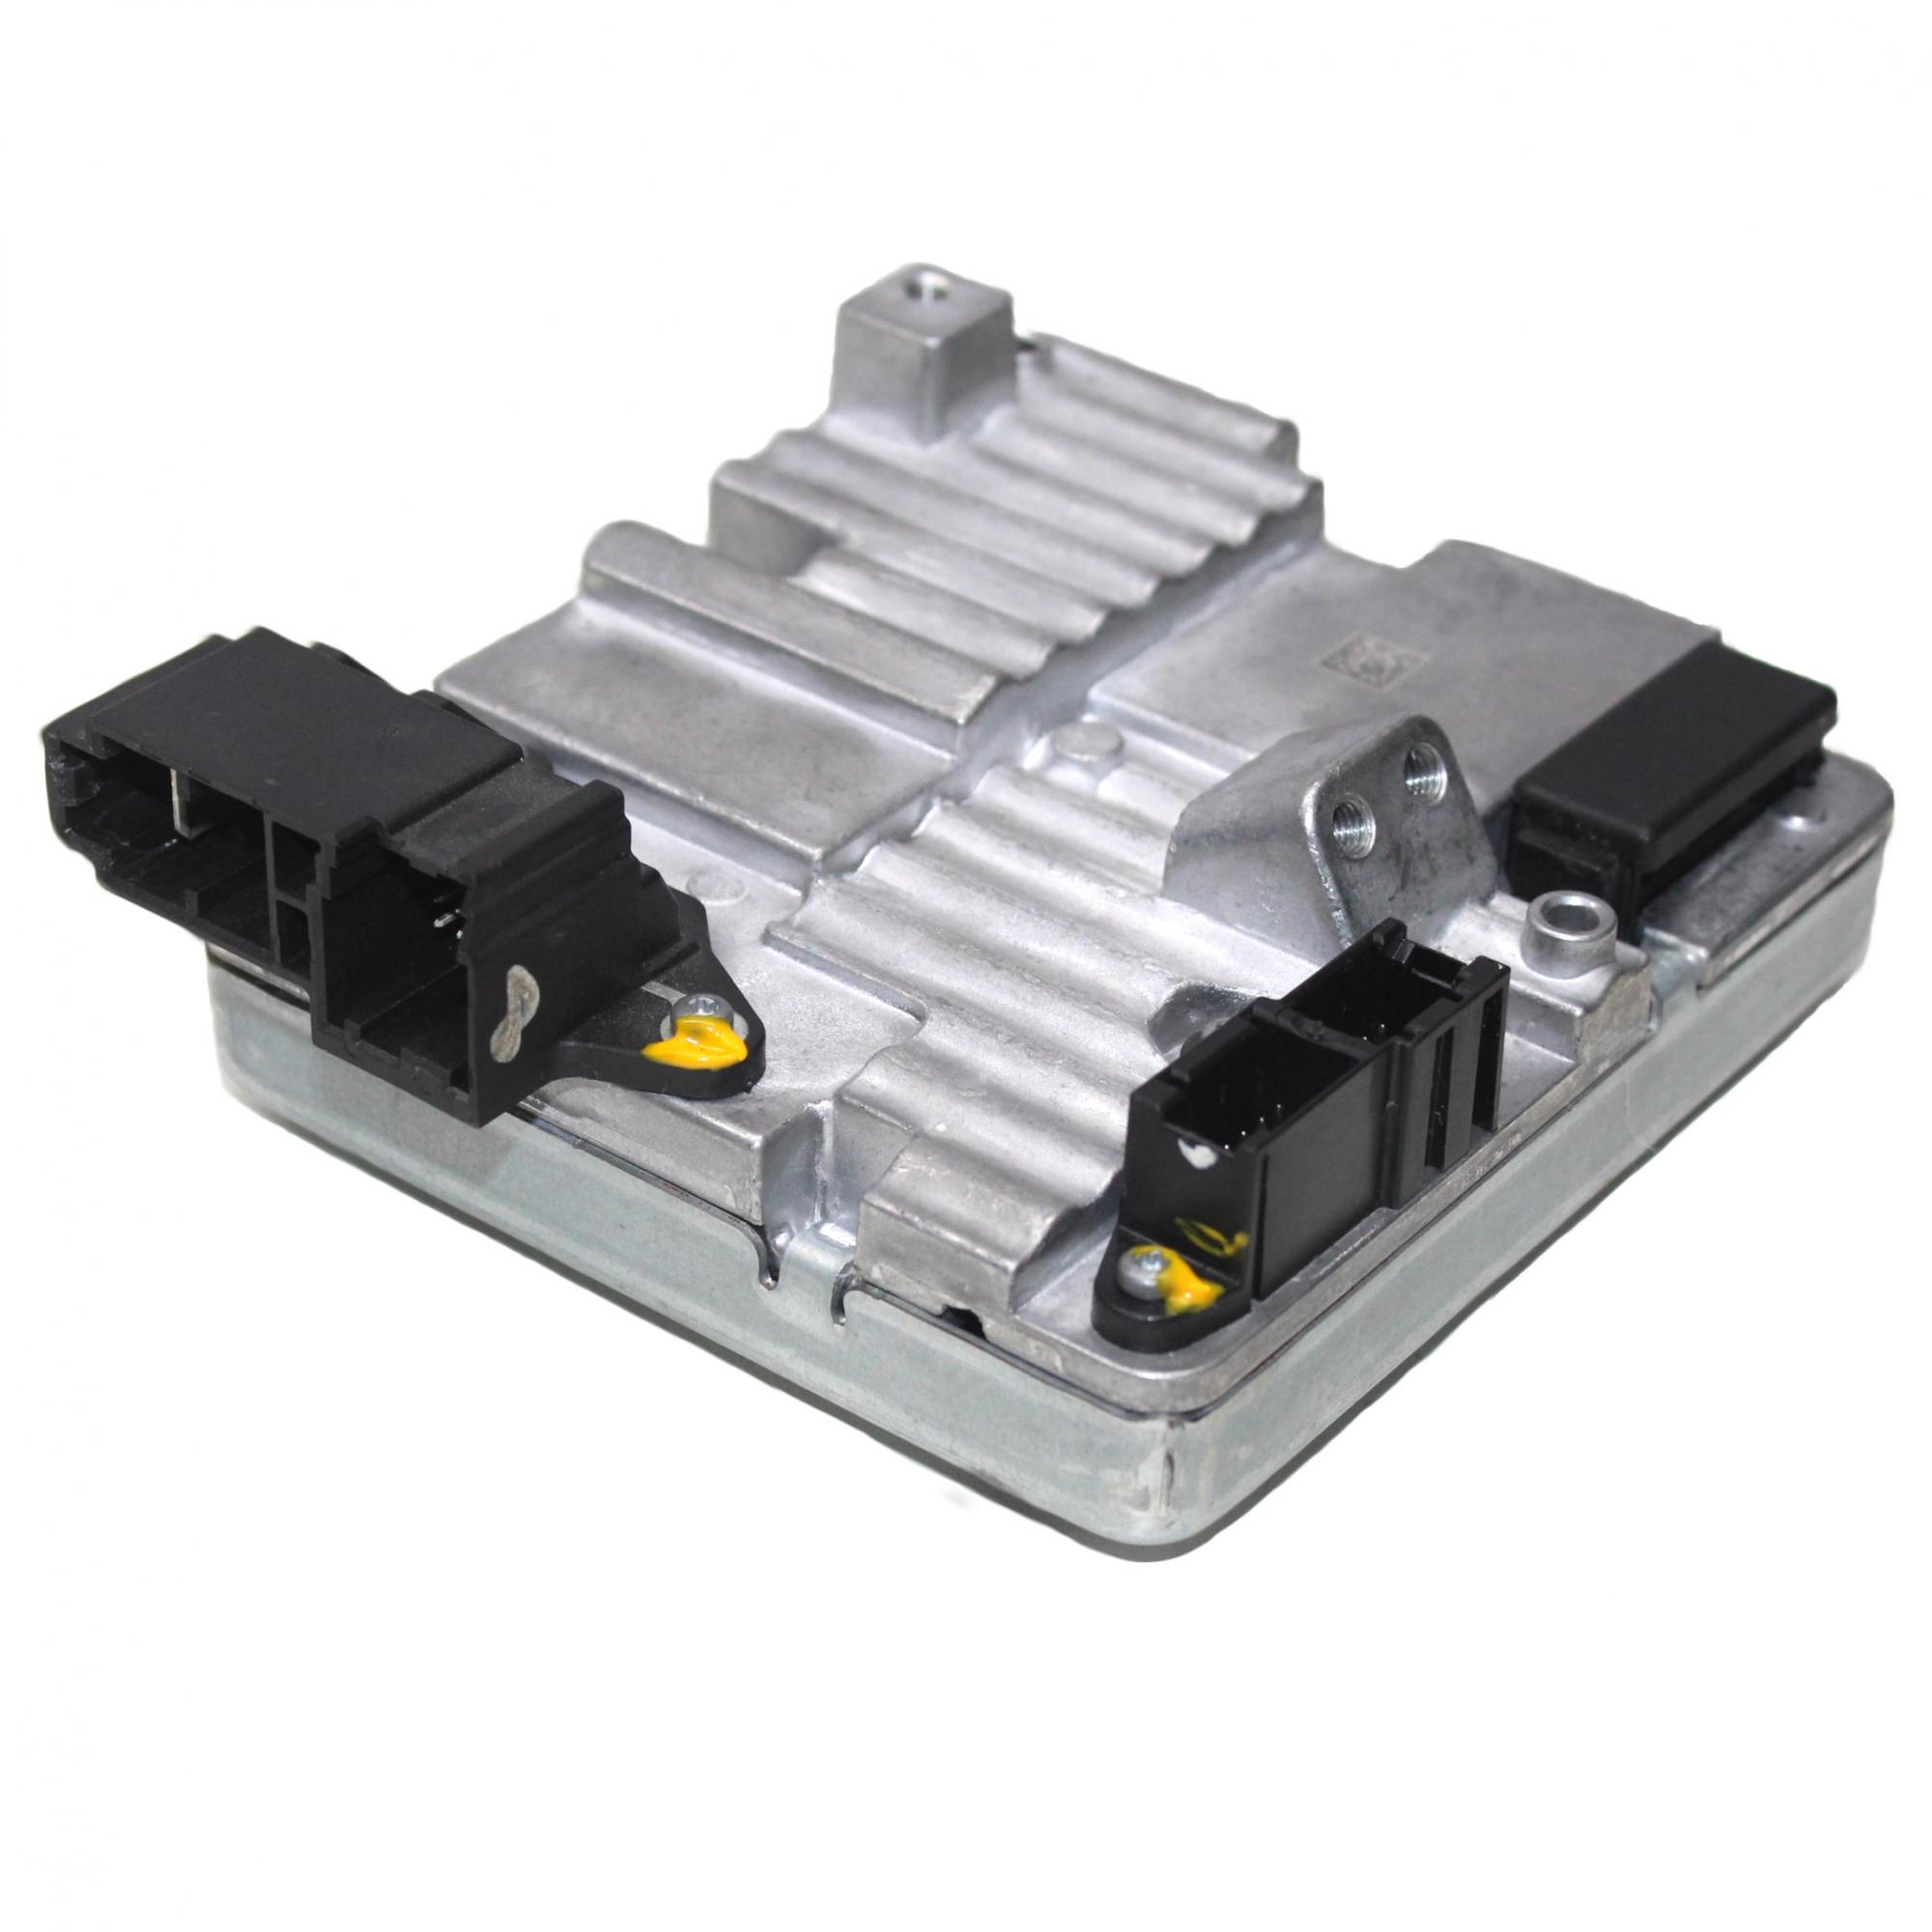 Modulo Direção Elétrica TRW Onix, Prisma 2017, 2018, 2019, 2020